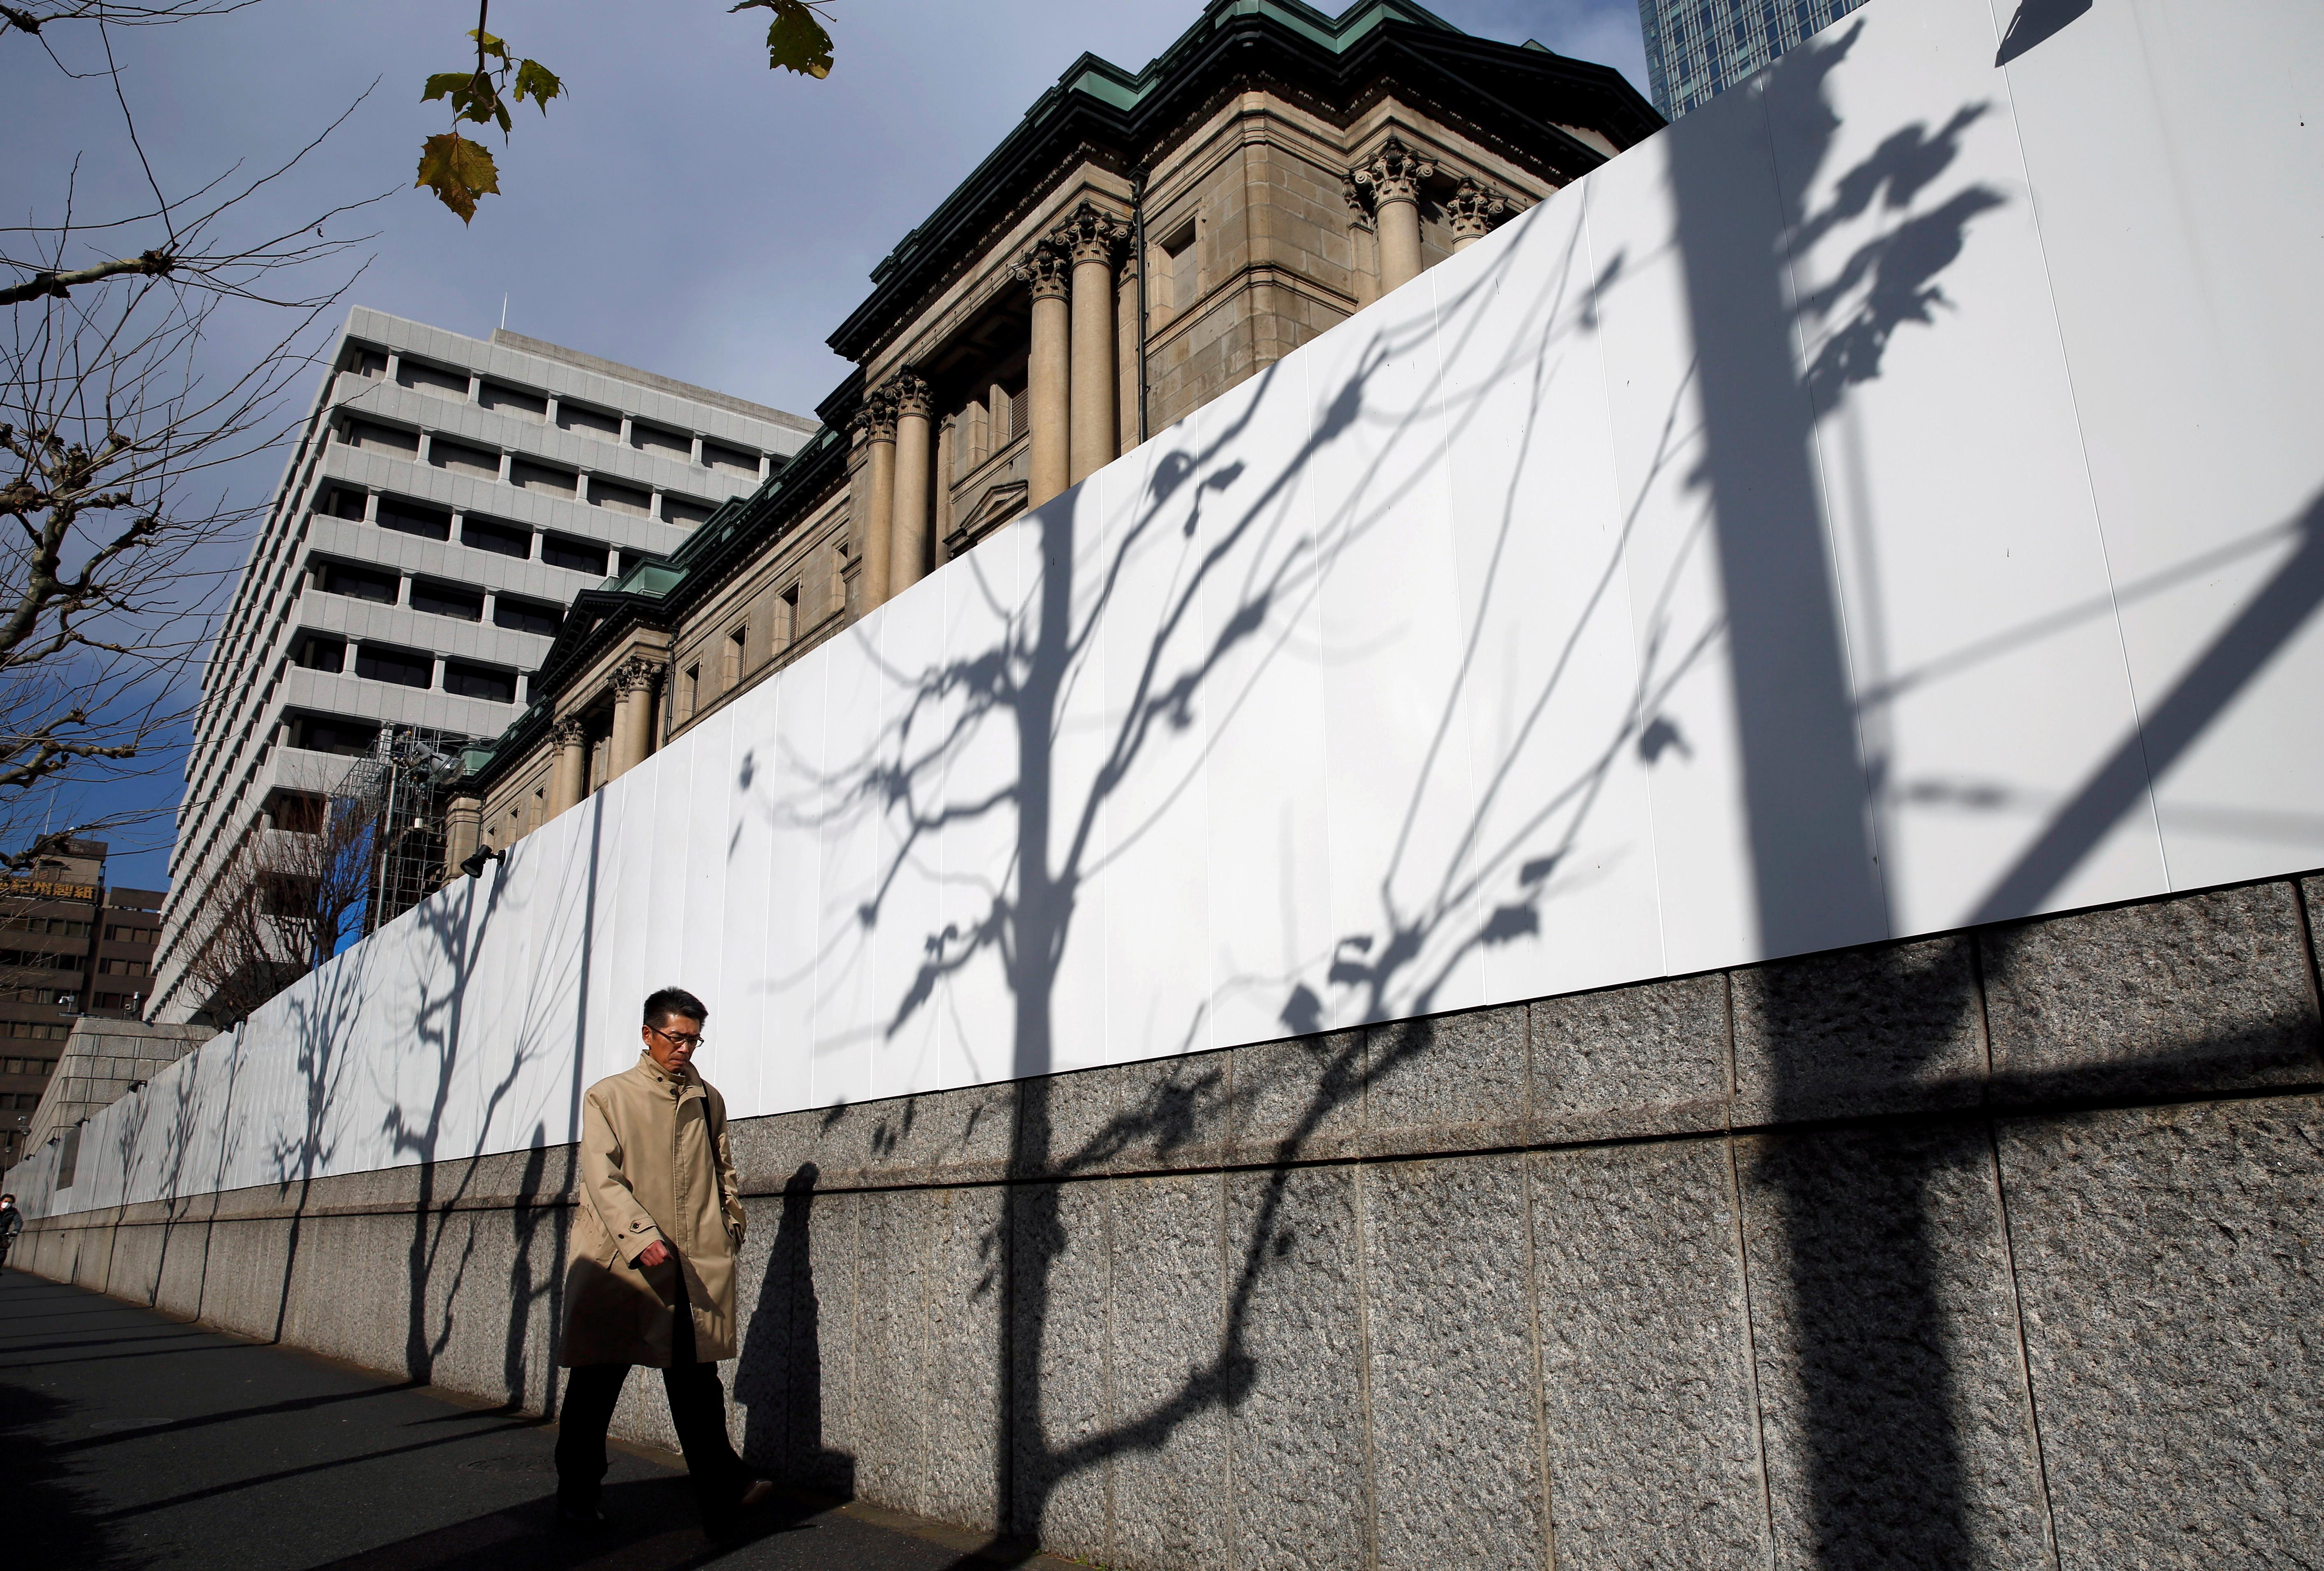 A man walks past the Bank of Japan building in Tokyo, Japan January 15, 2018. REUTERS/Kim Kyung-Hoon